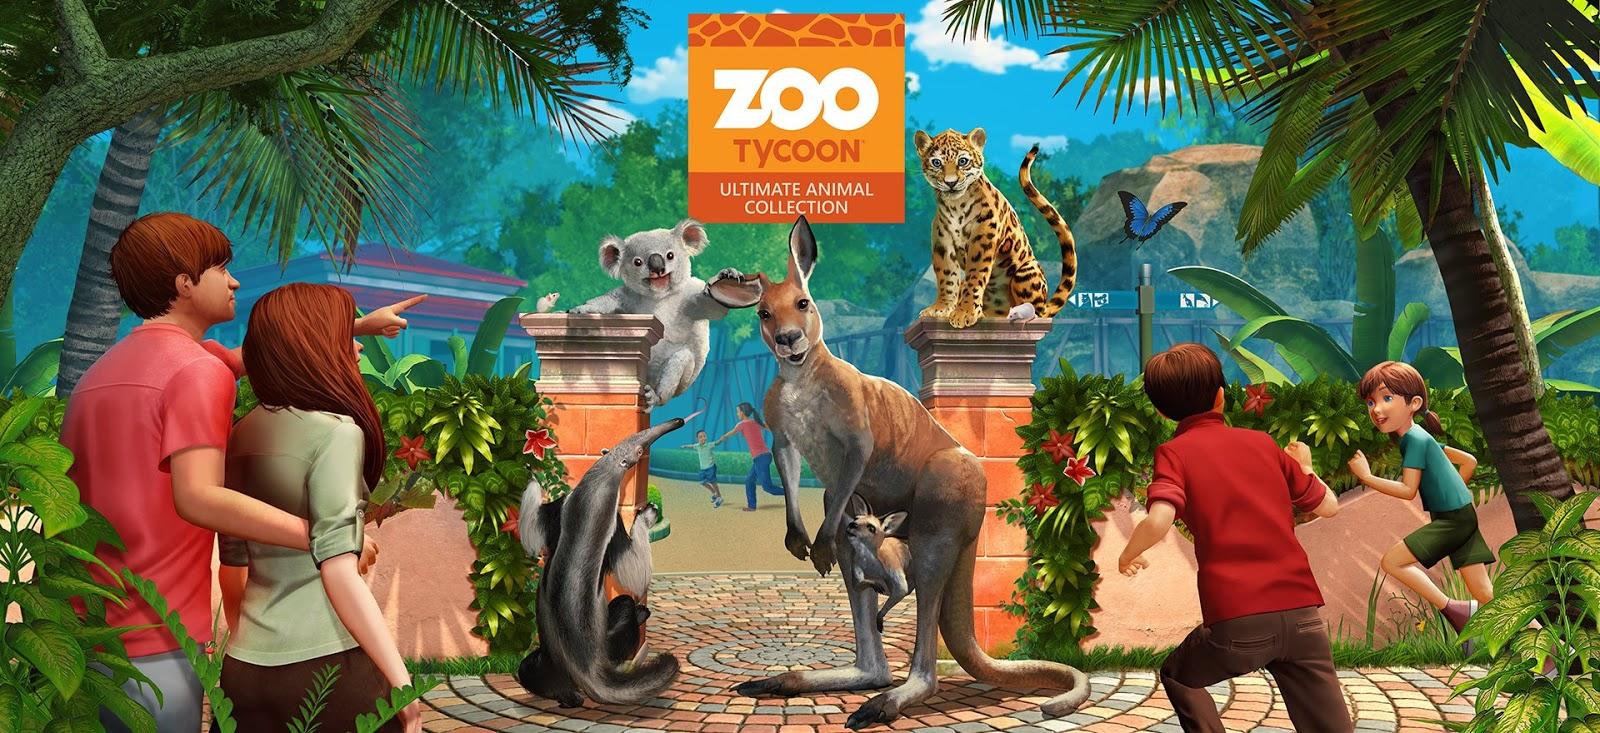 zoo tycoon mac torrent lion - zoo tycoon mac torrent lion: